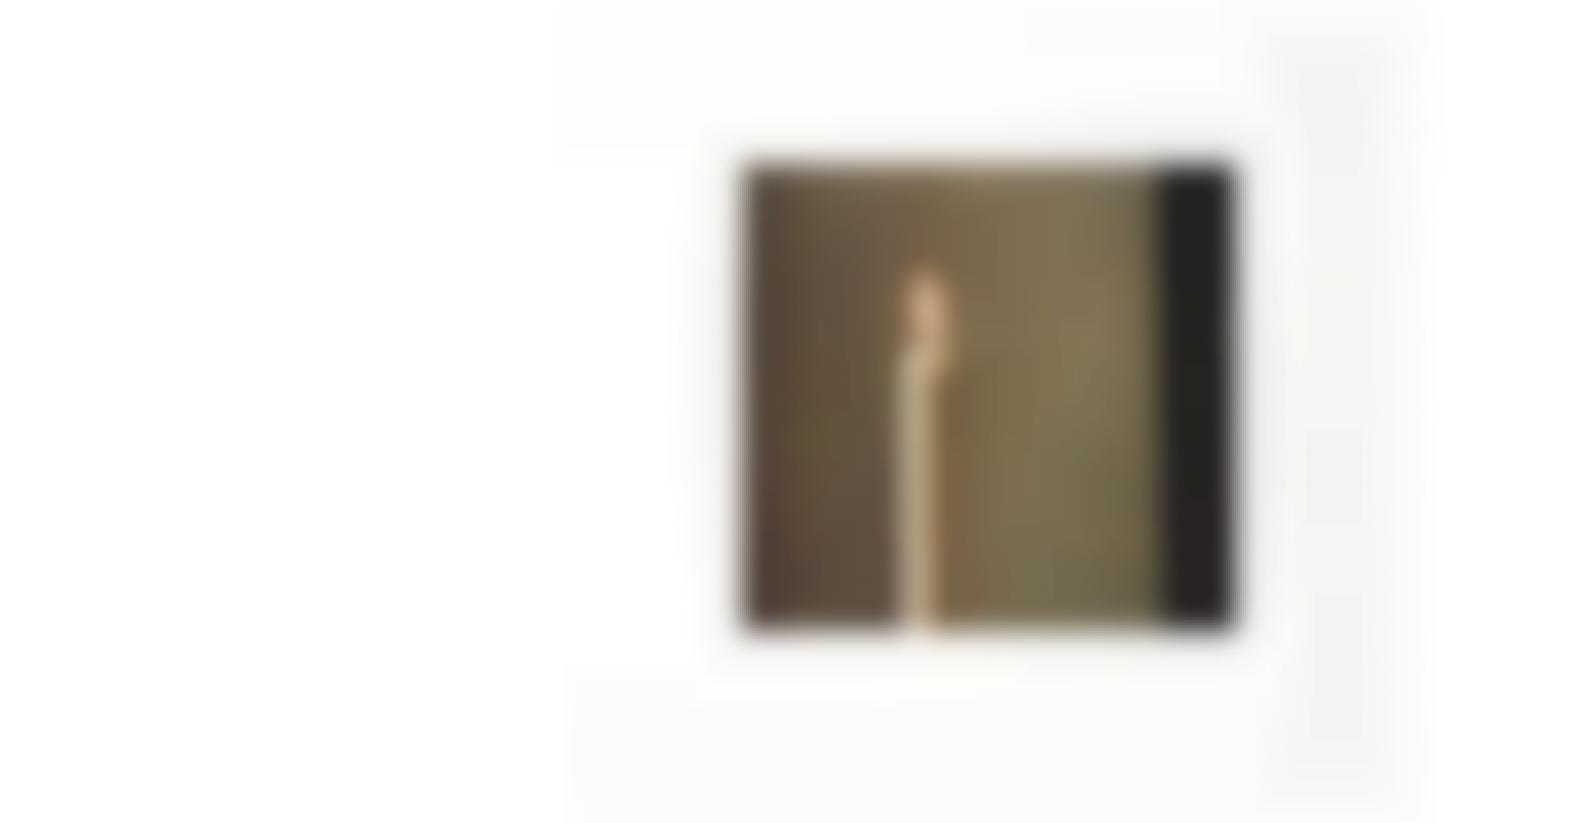 Gerhard Richter-Kerze II (Candle II) (Butin 66)-1989